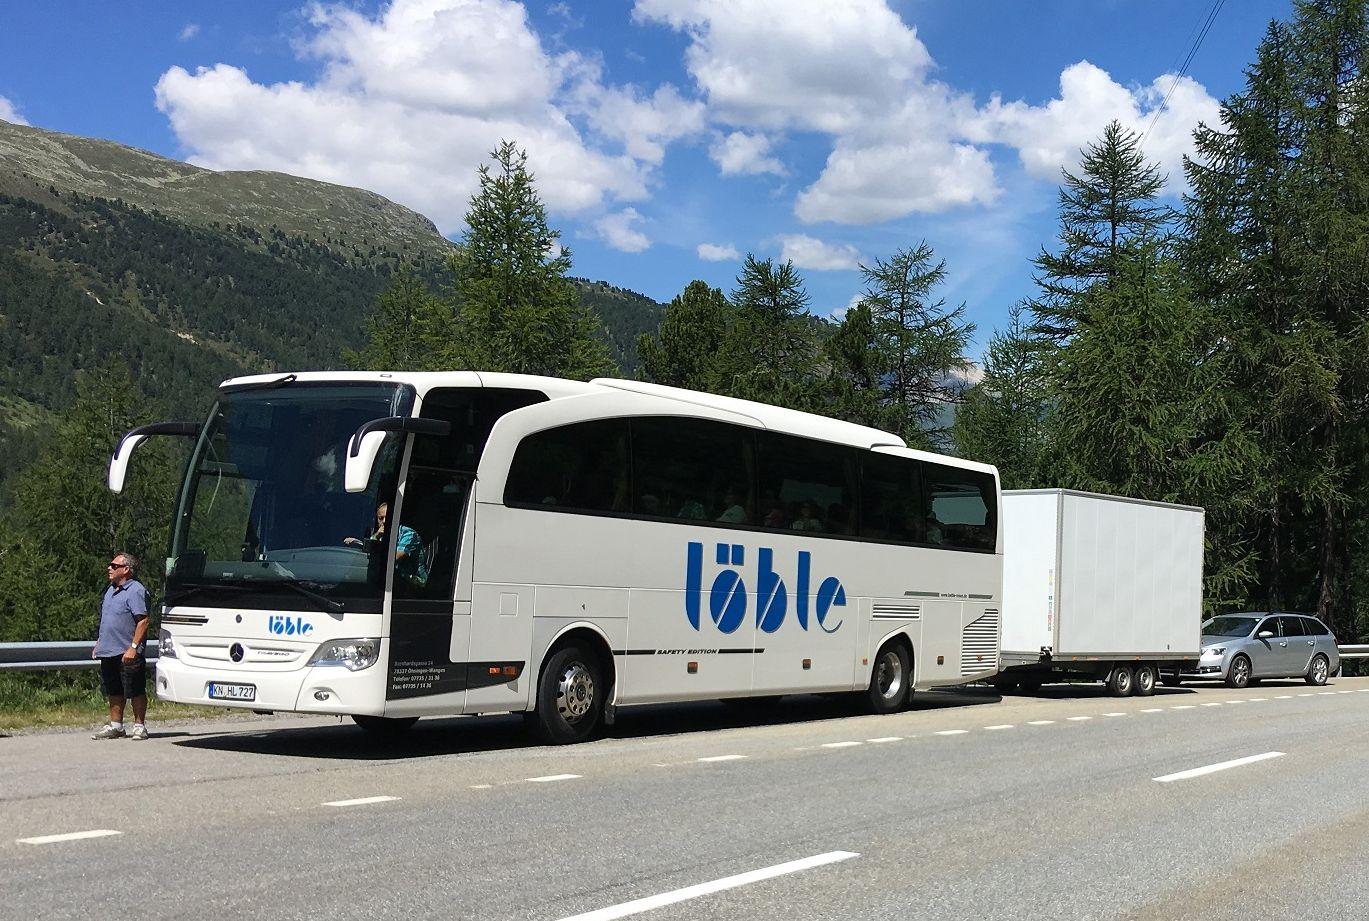 Loeble -Bus